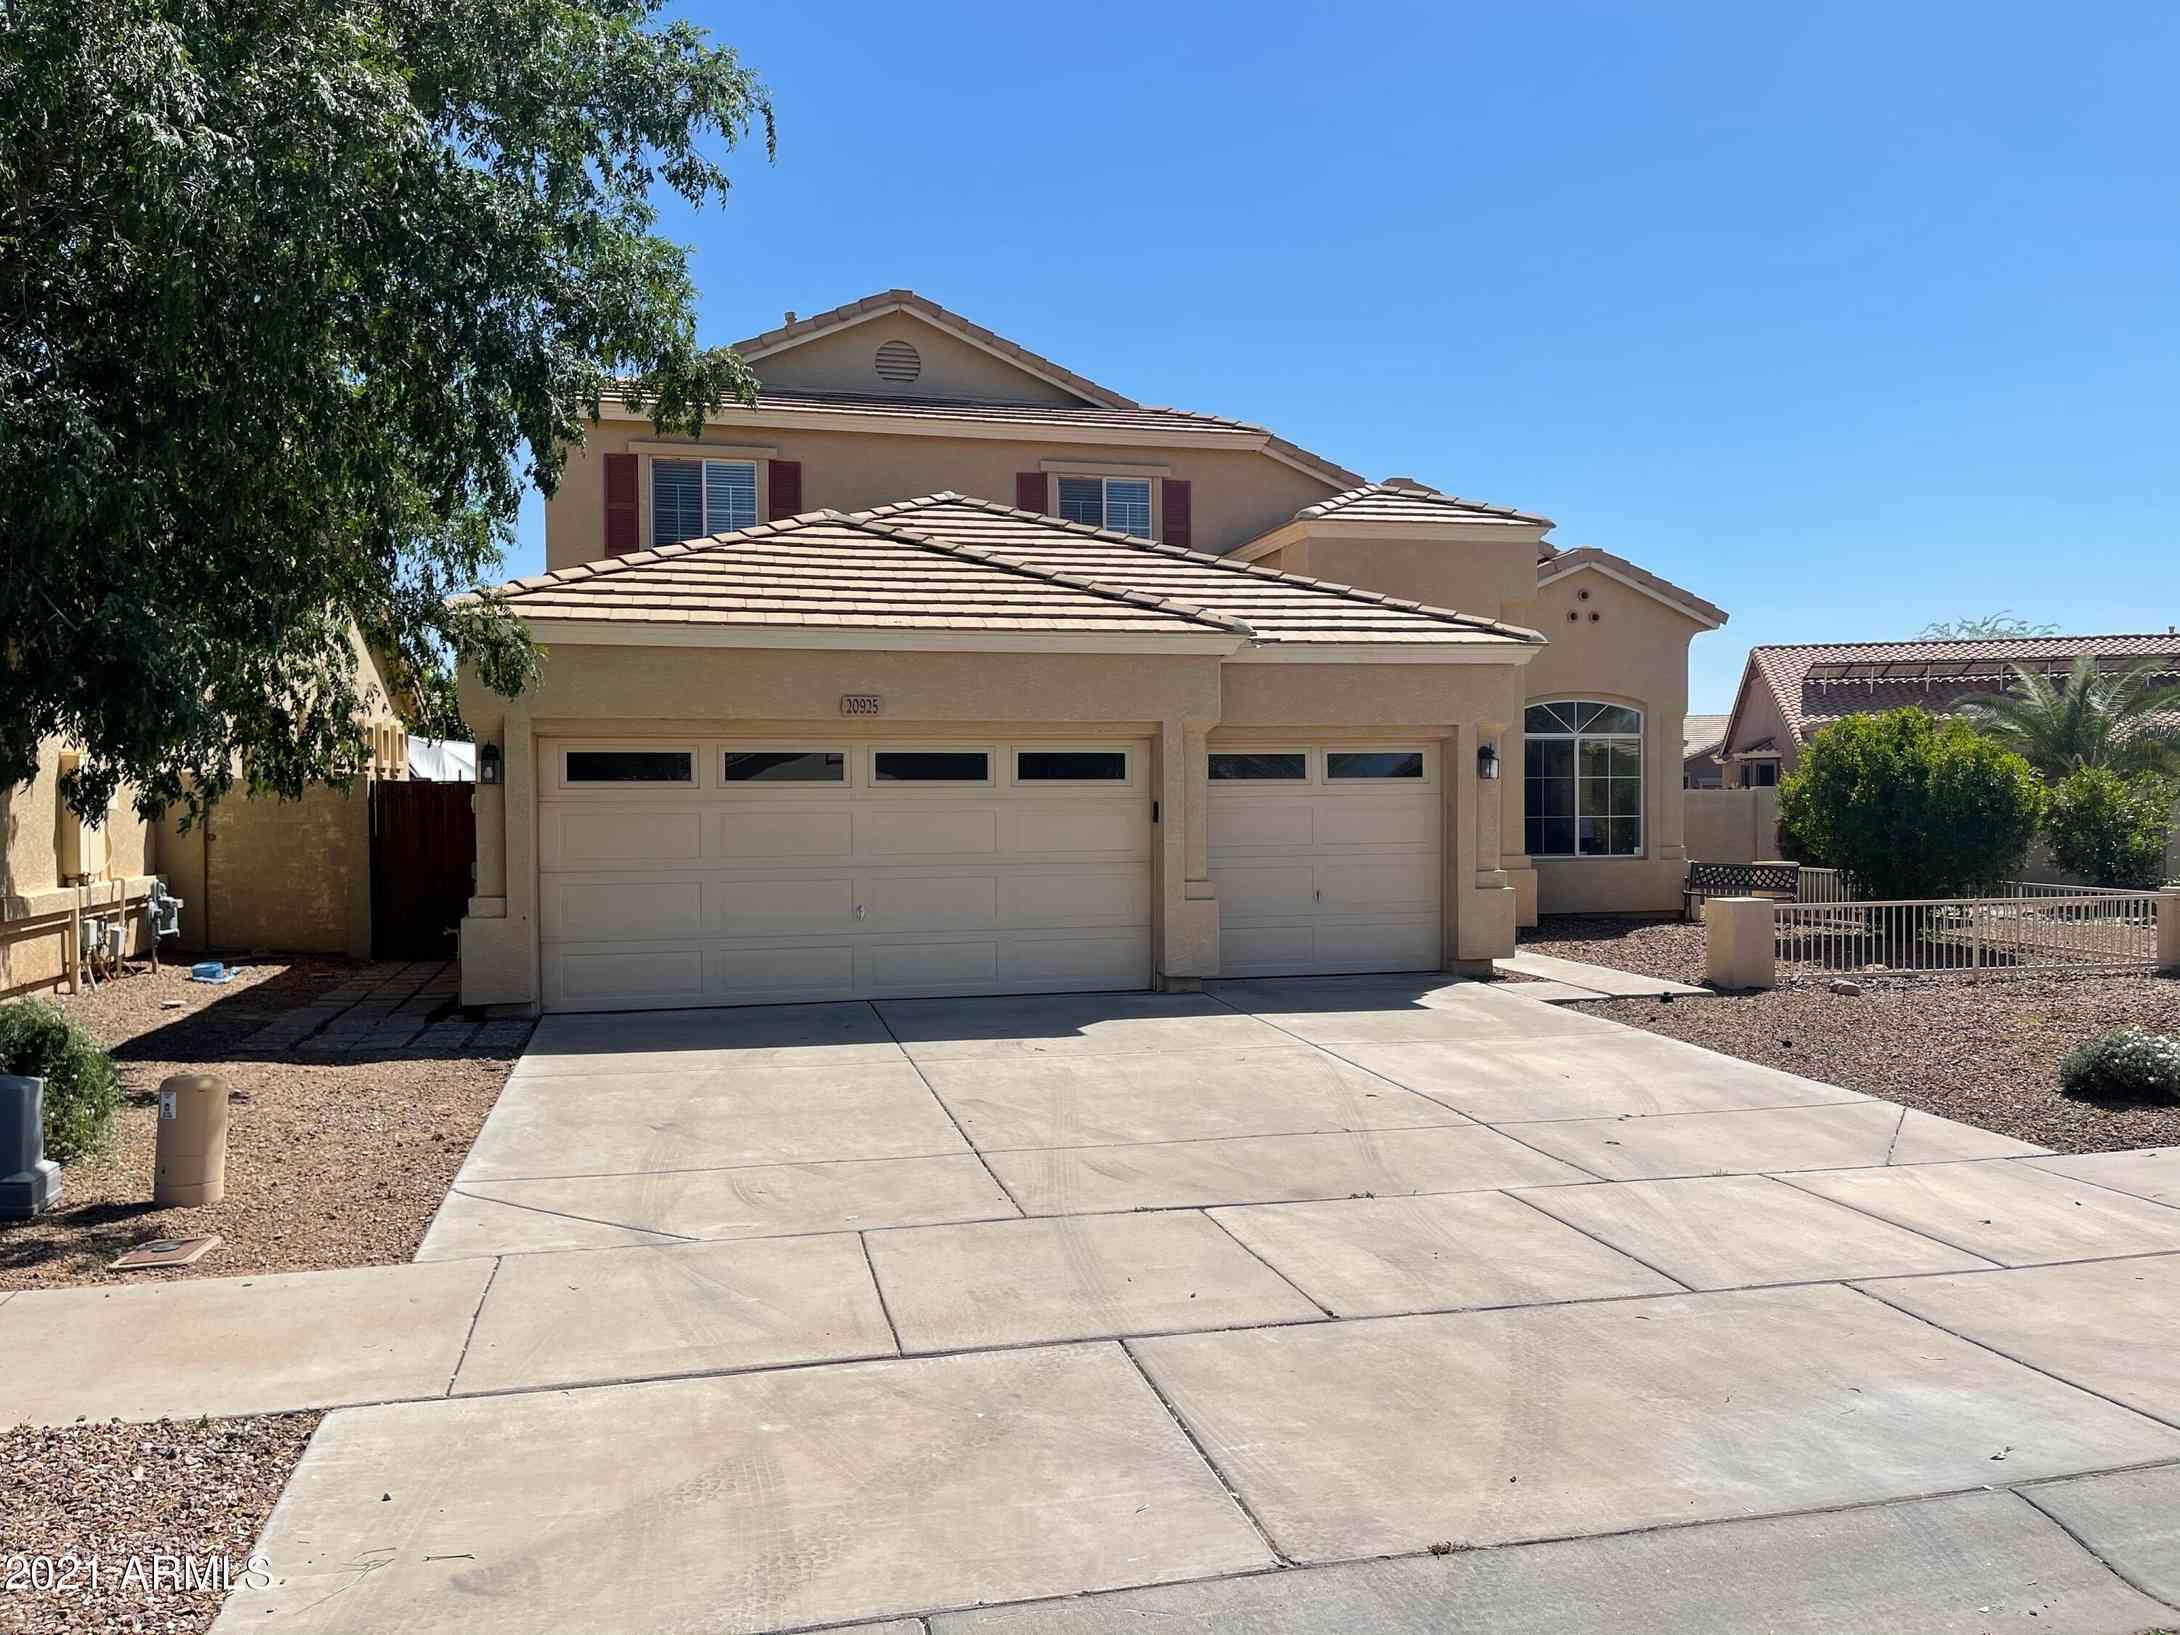 20925 E VIA DEL ORO --, Queen Creek, AZ, 85142,